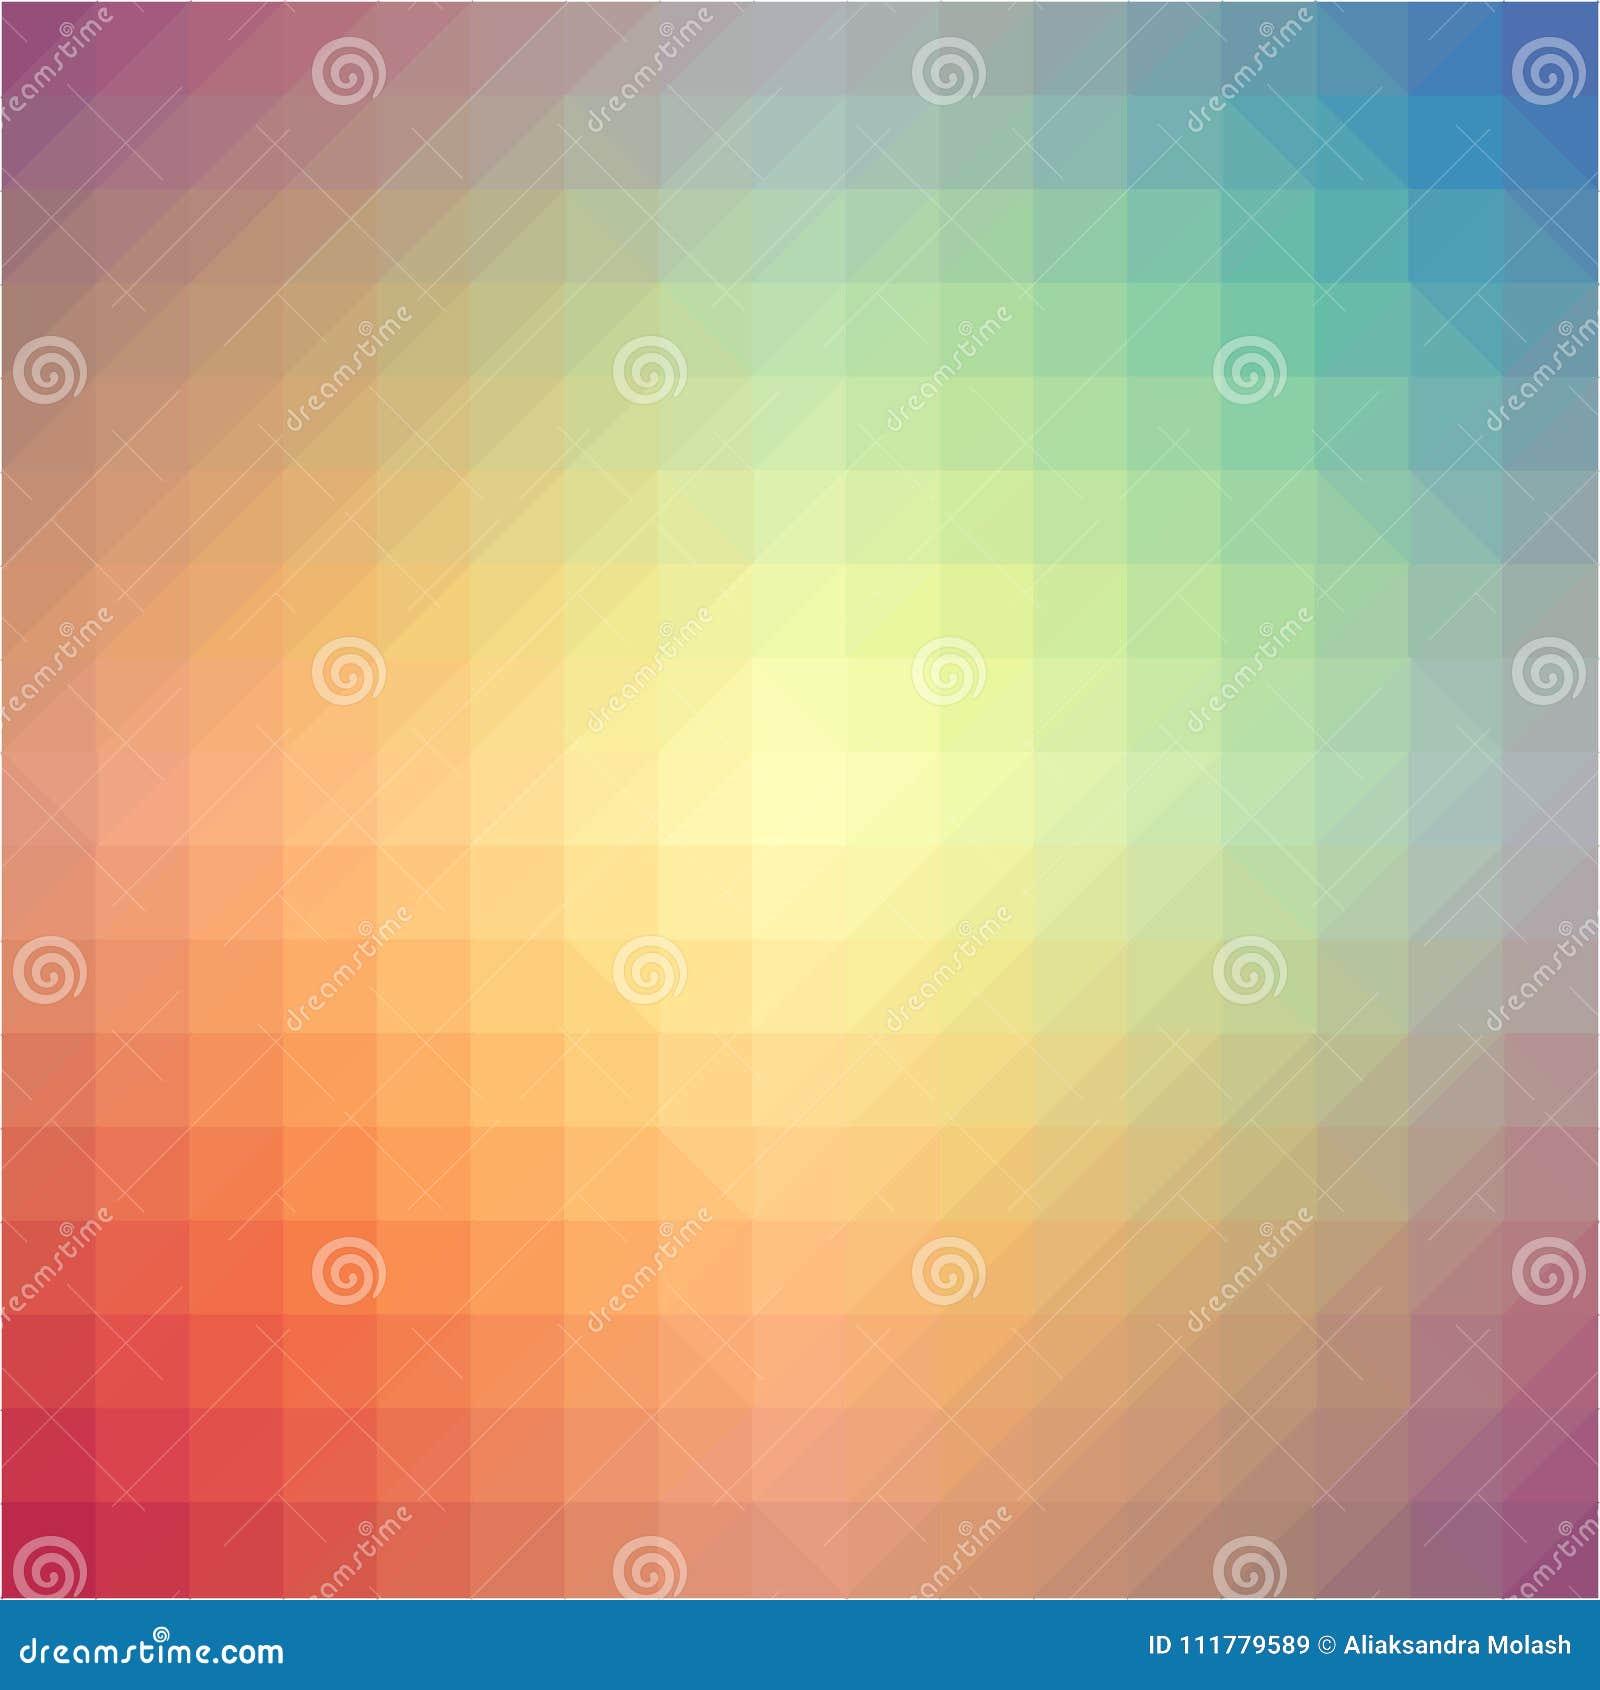 Light rainbow triangle gradient background